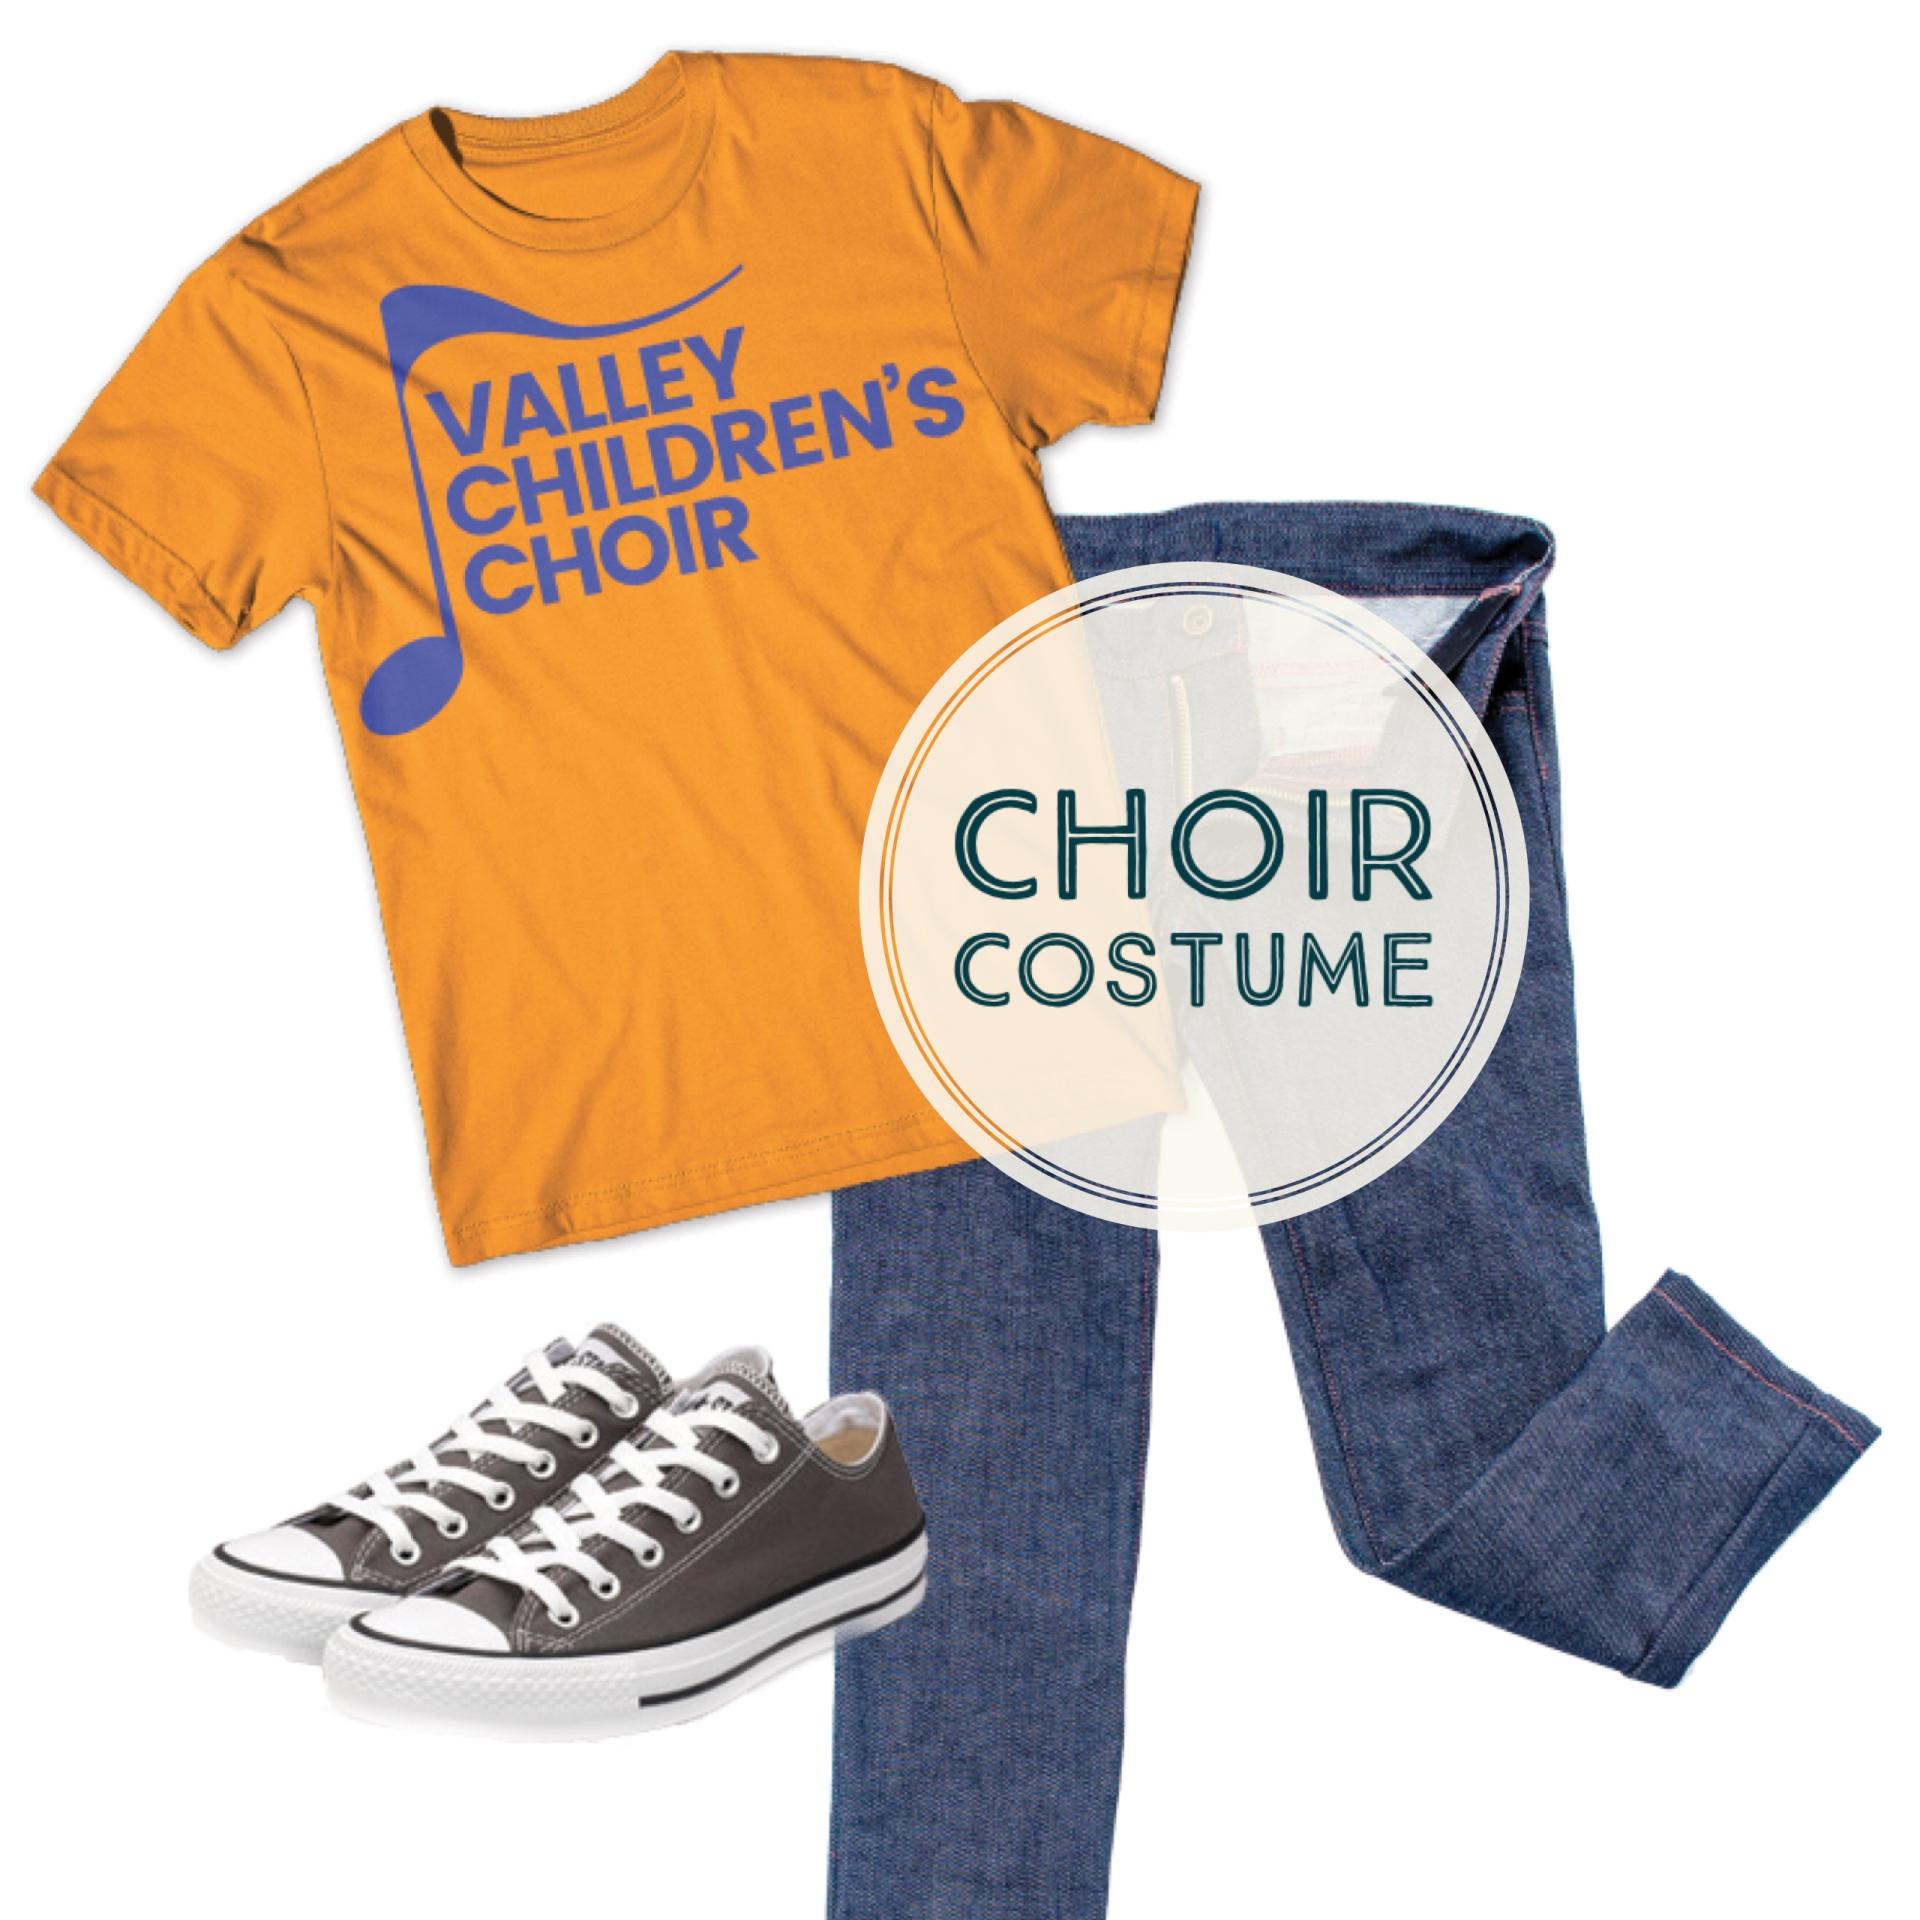 Costumes & Uniforms